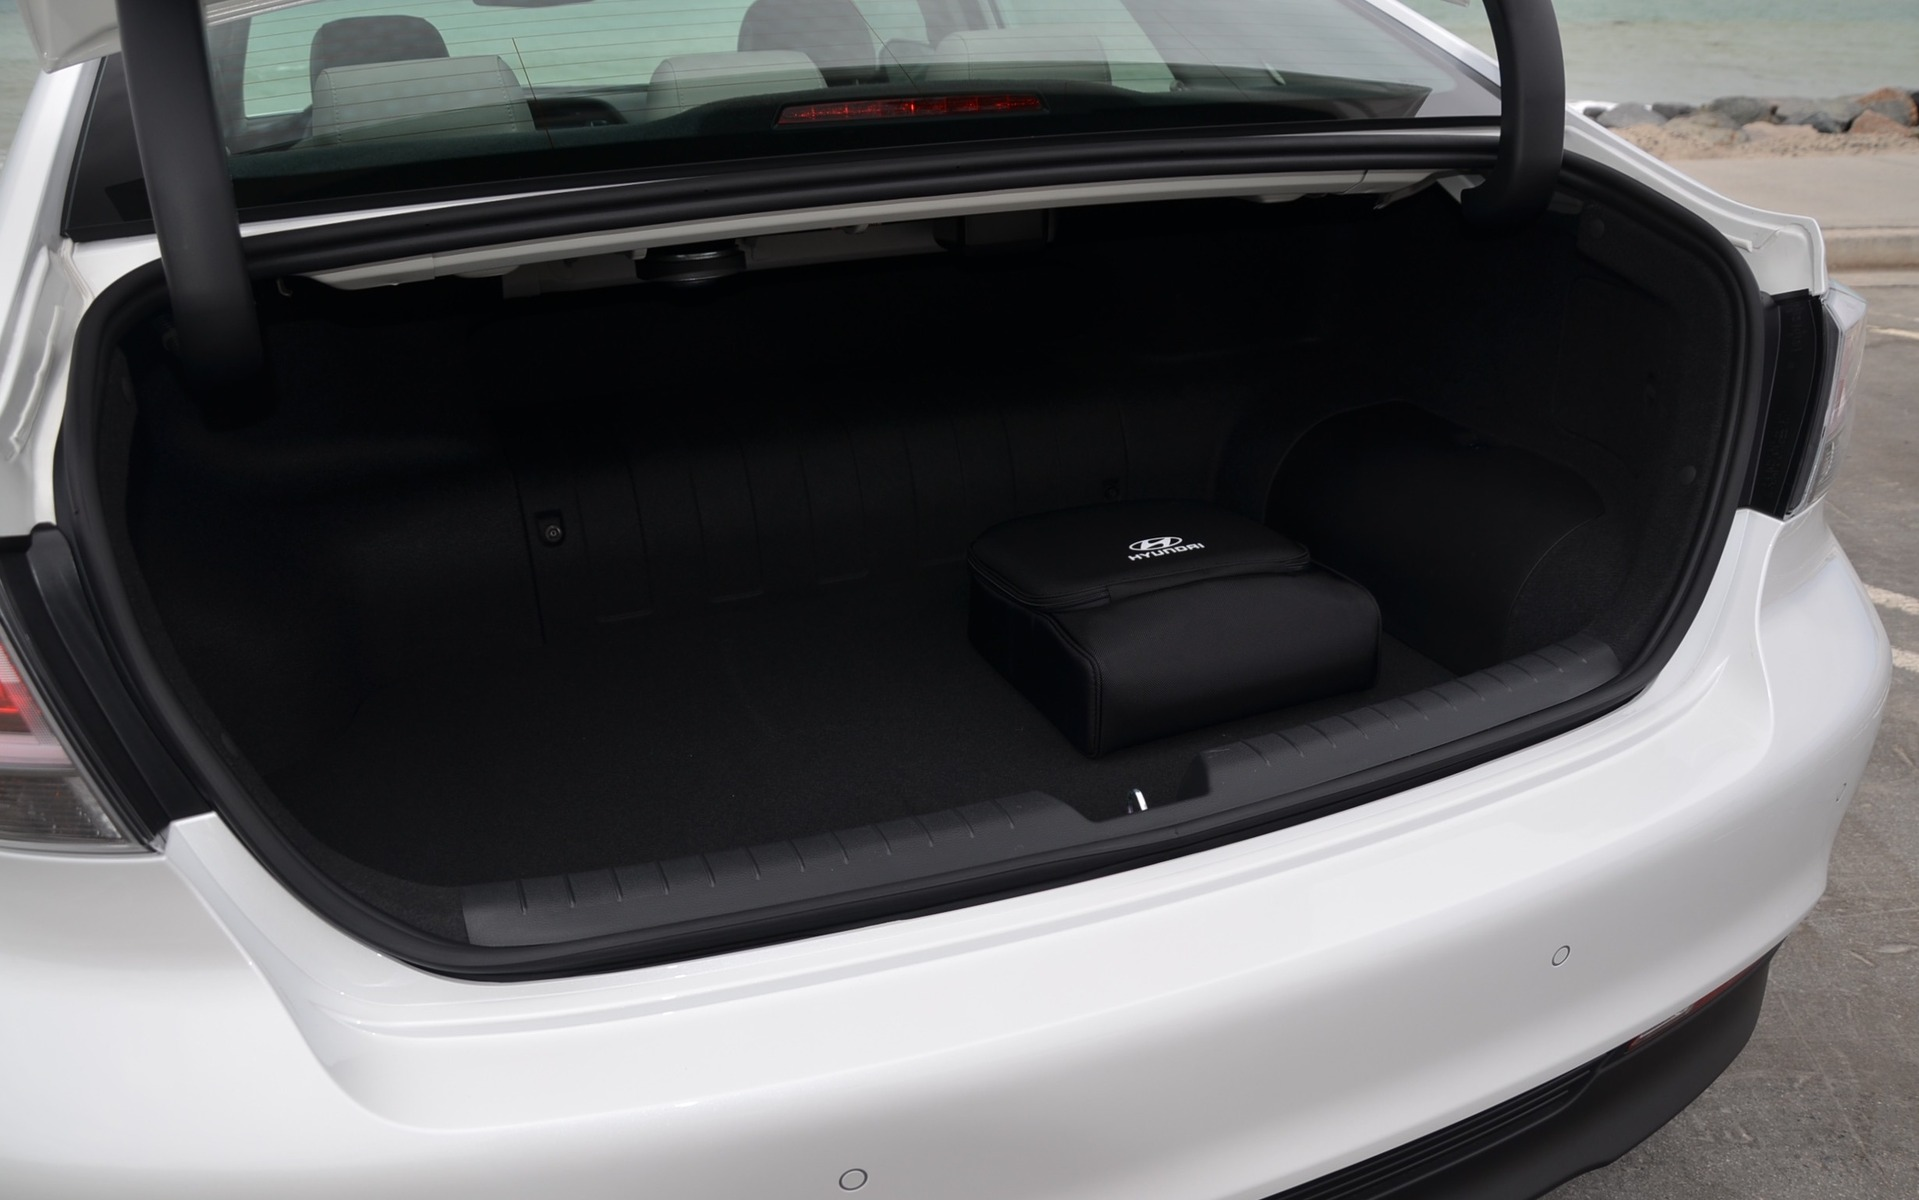 Hyundai Sonata Hybrid 2016 - Volume du coffre